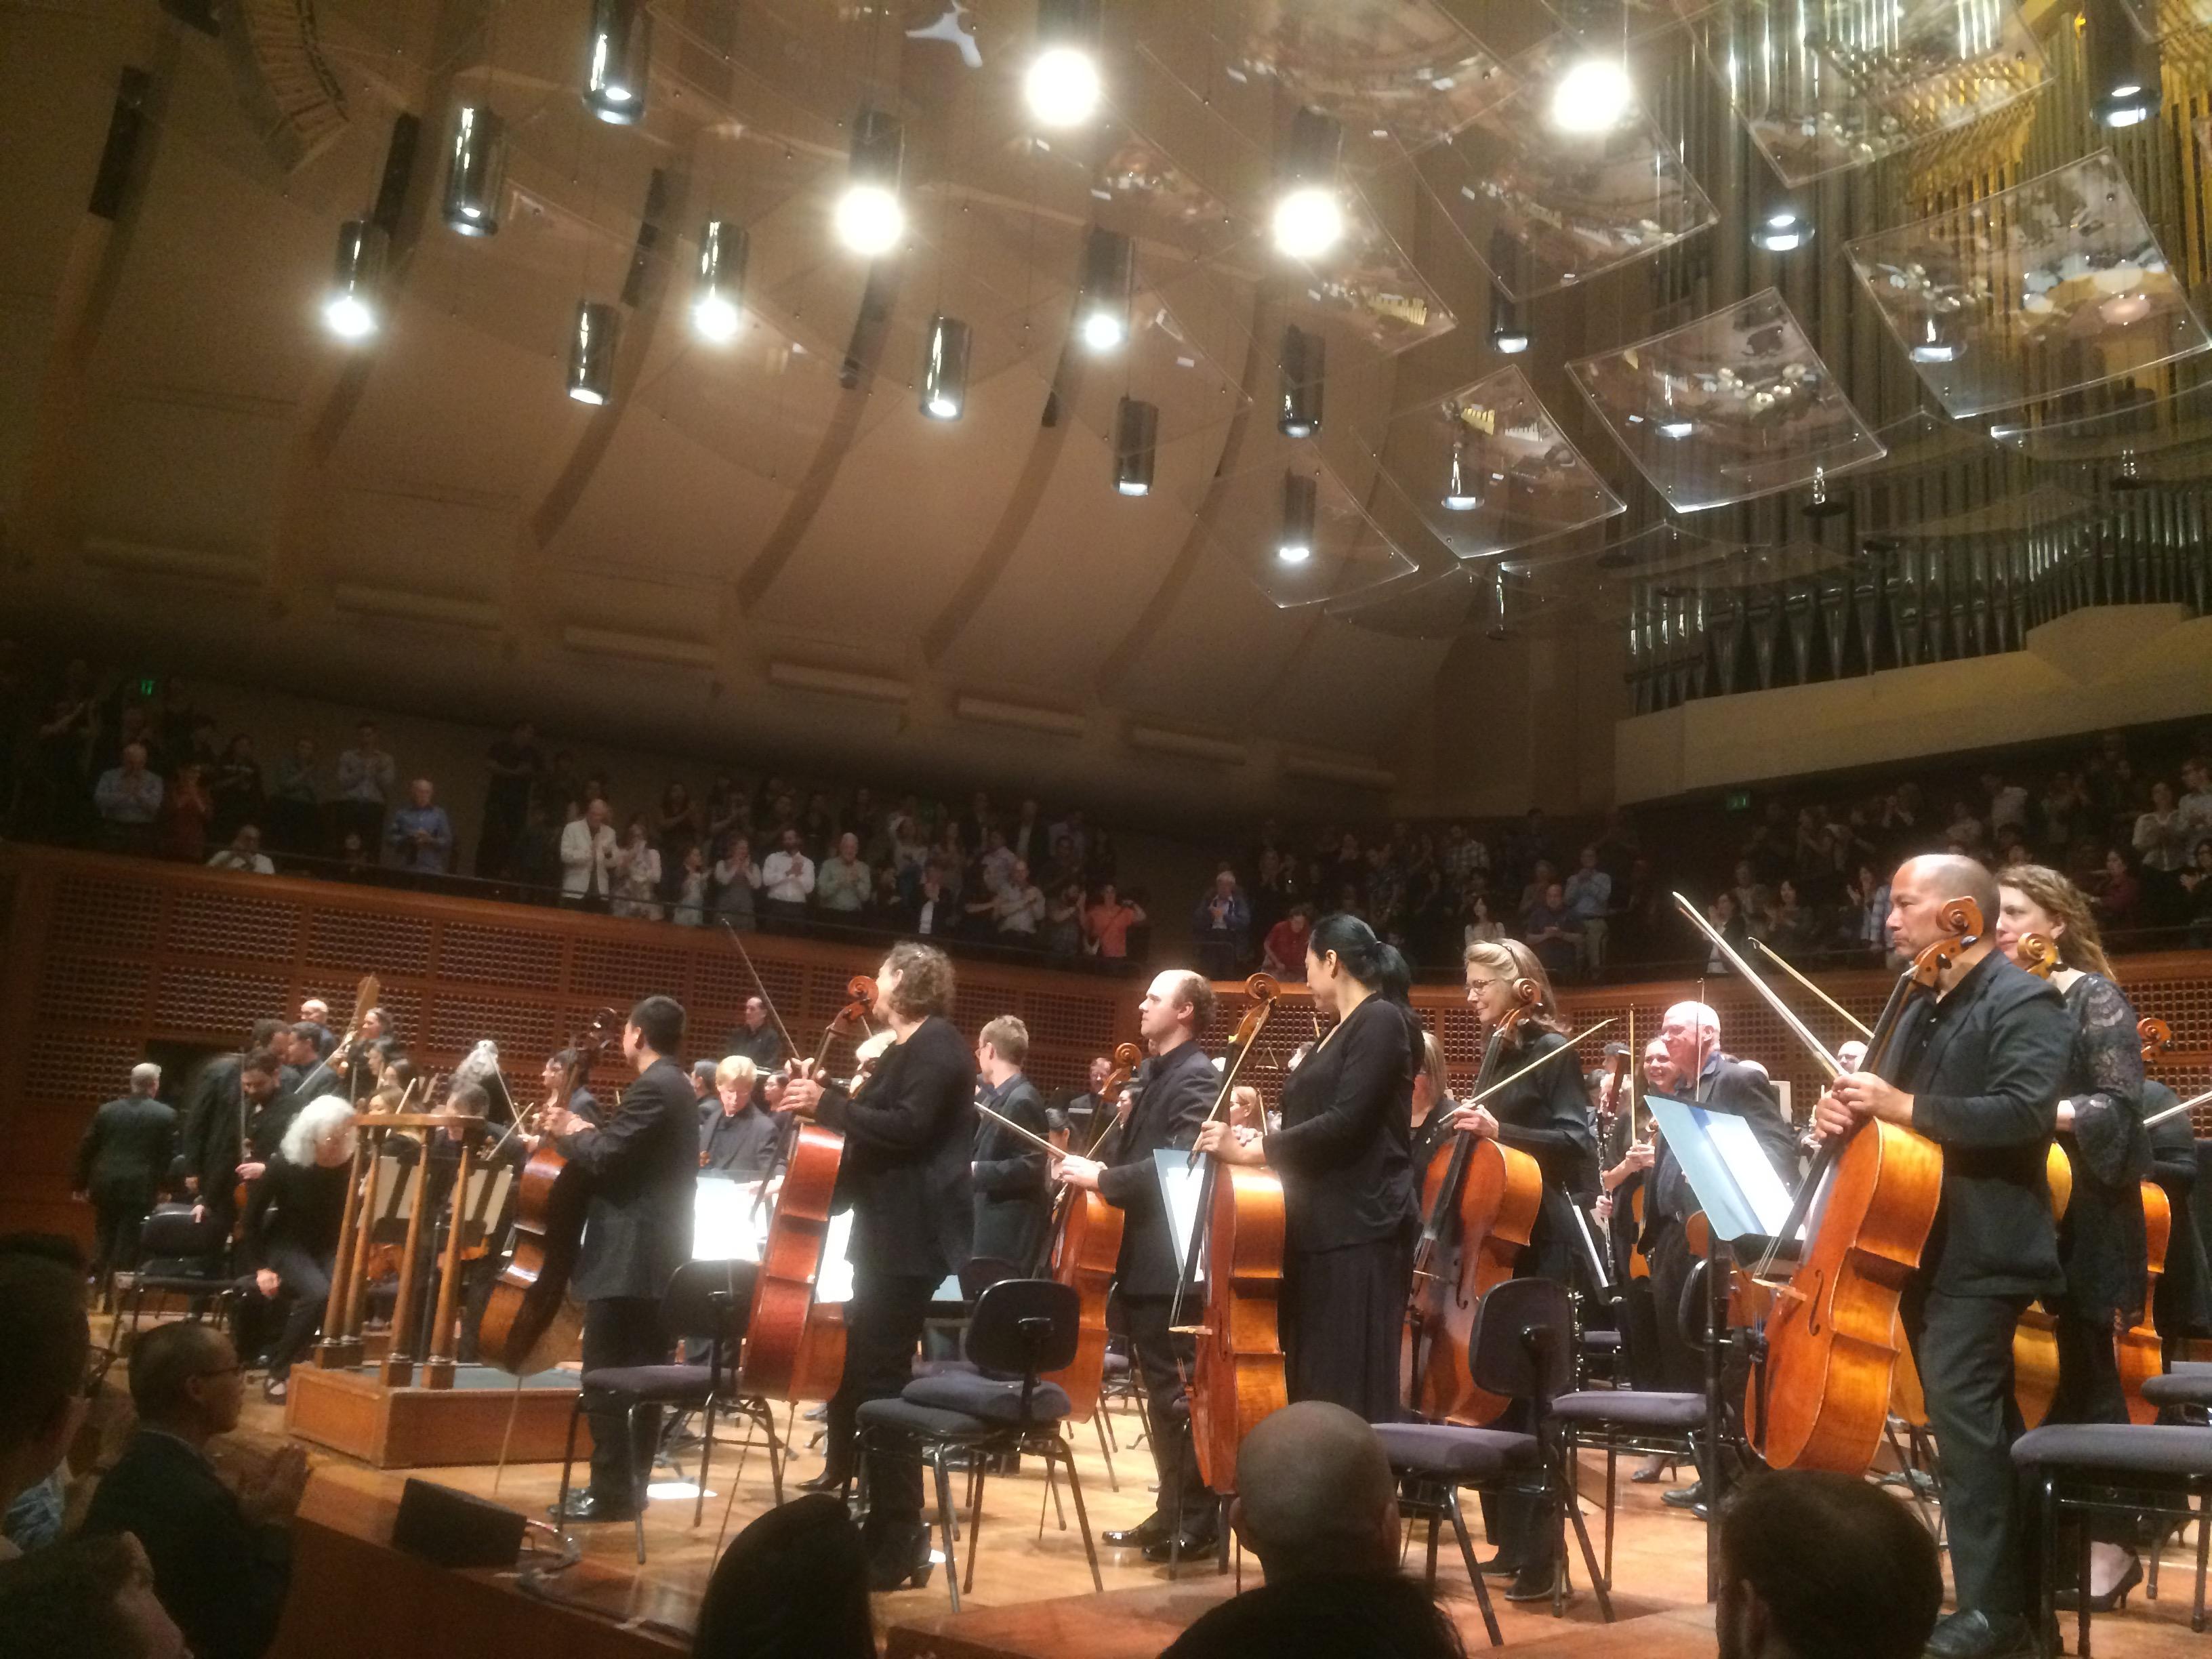 SF Symphony - The Music of John Williams